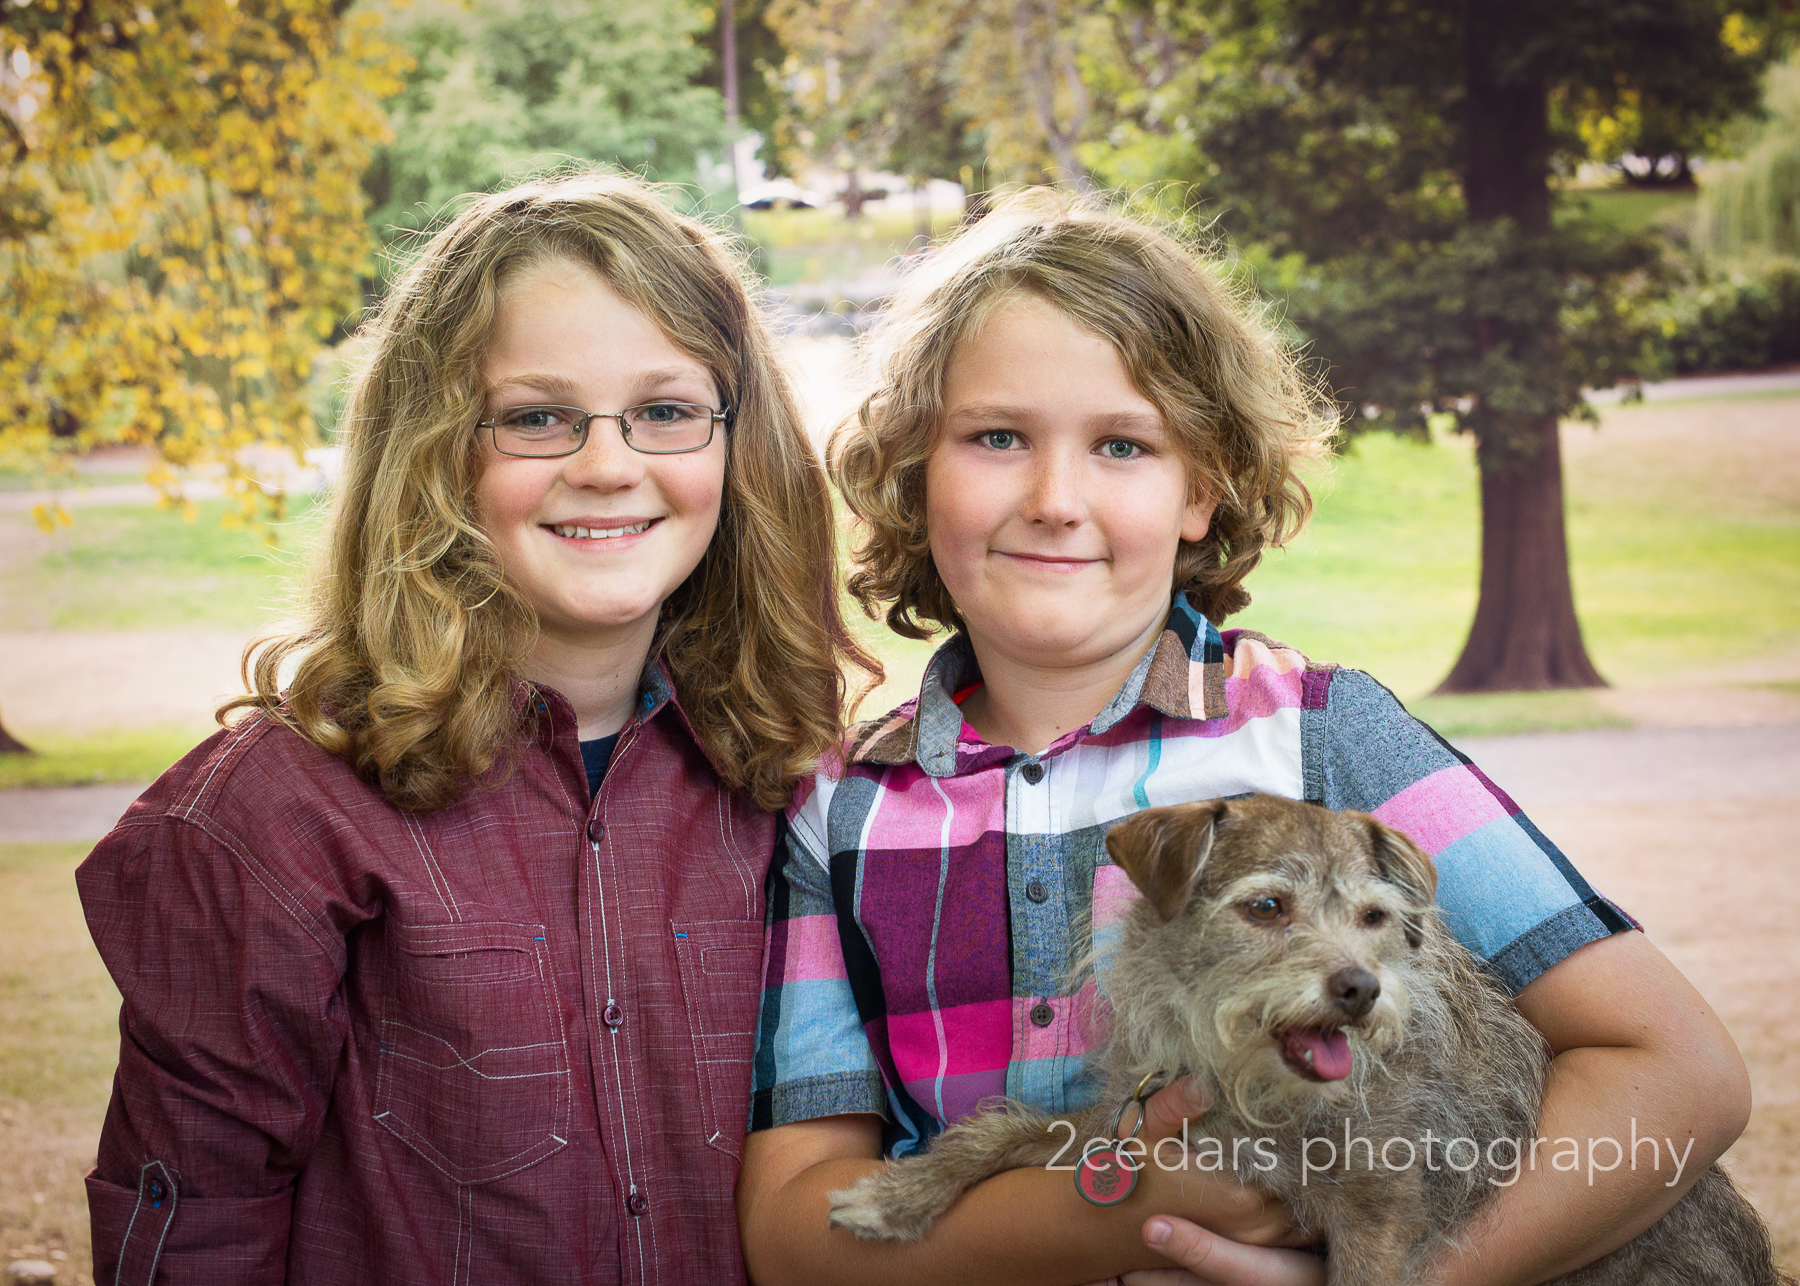 2cedarsphoto-Sullivan-Family-Web-2.jpg